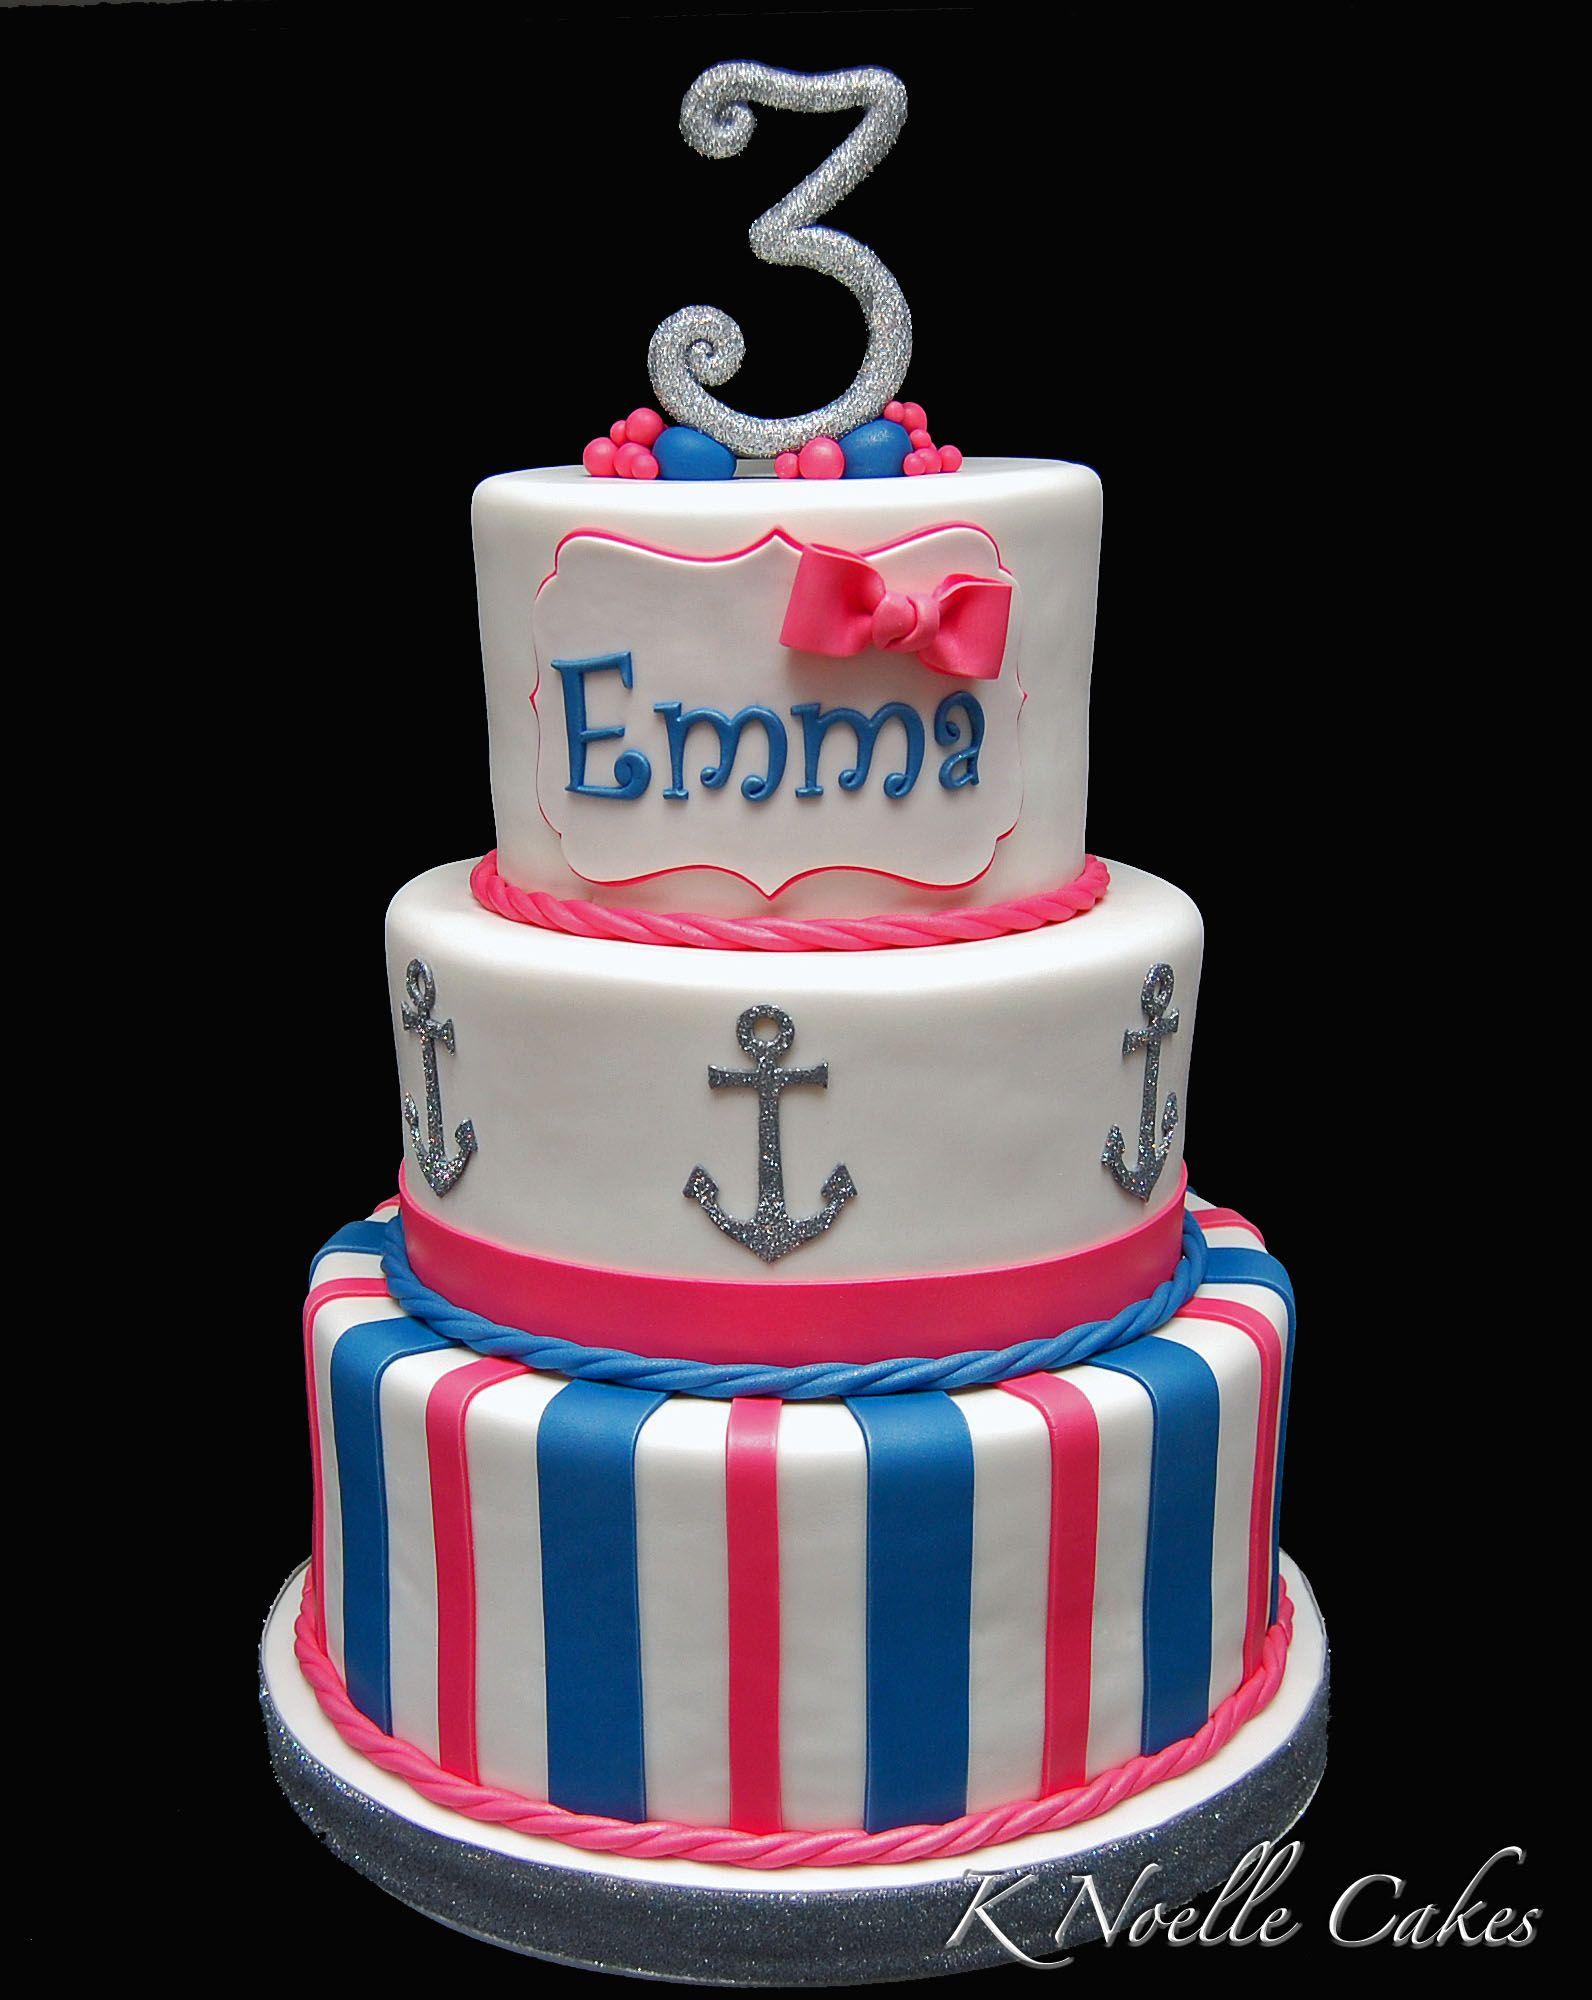 Nautical theme birthday cake by K Noelle Cakes